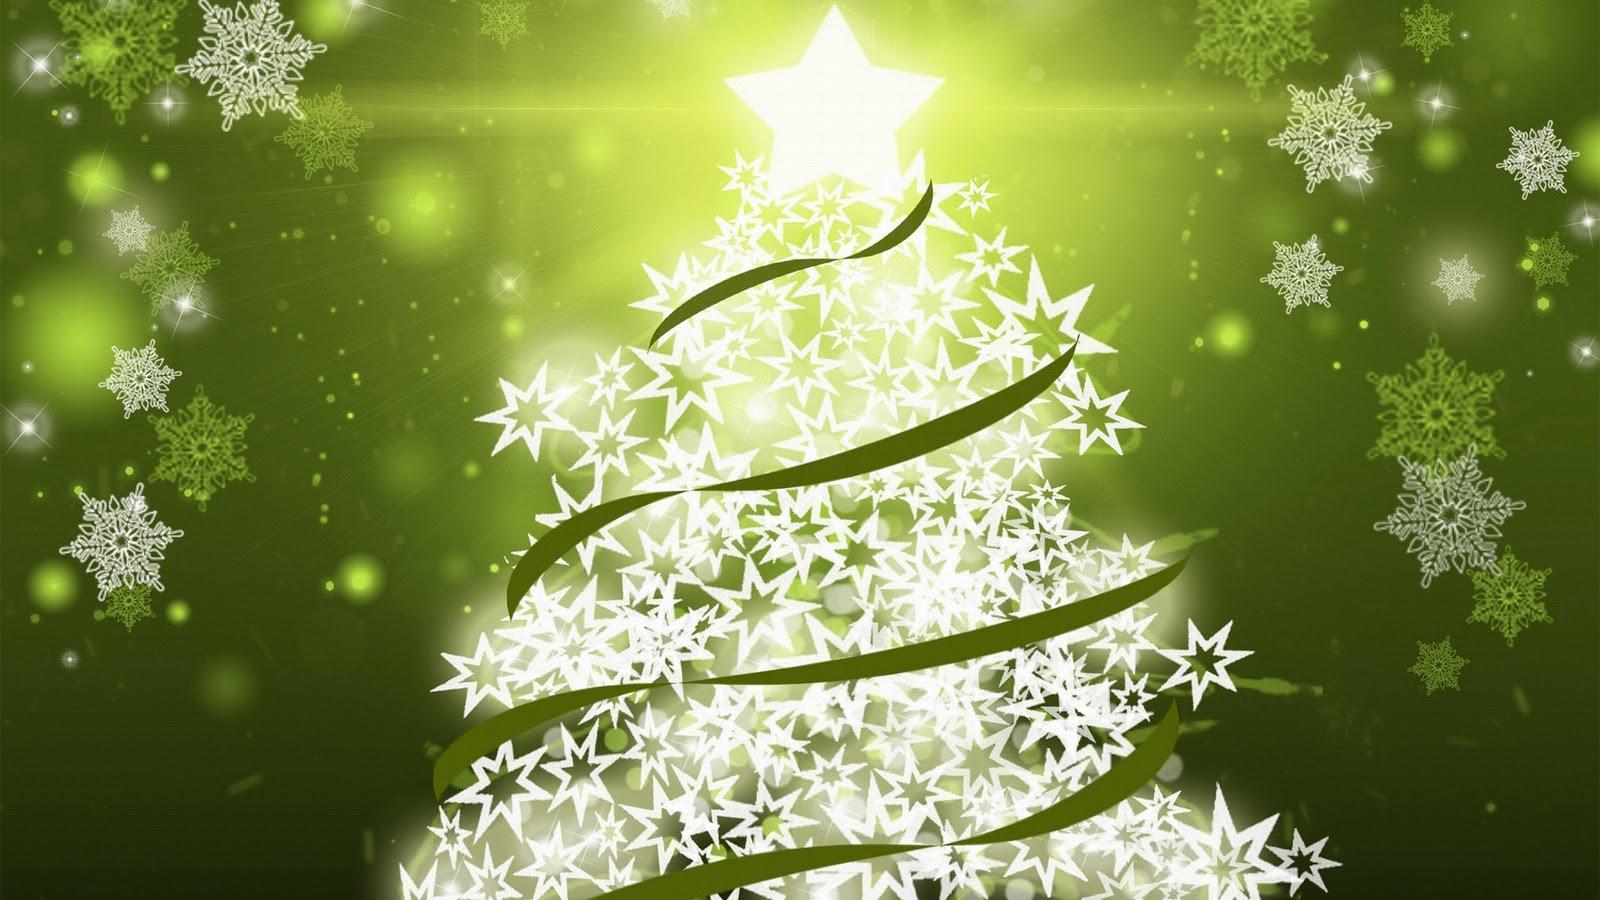 Merry Christmas Modern Kerst Achtergronden Hd Wallpapers